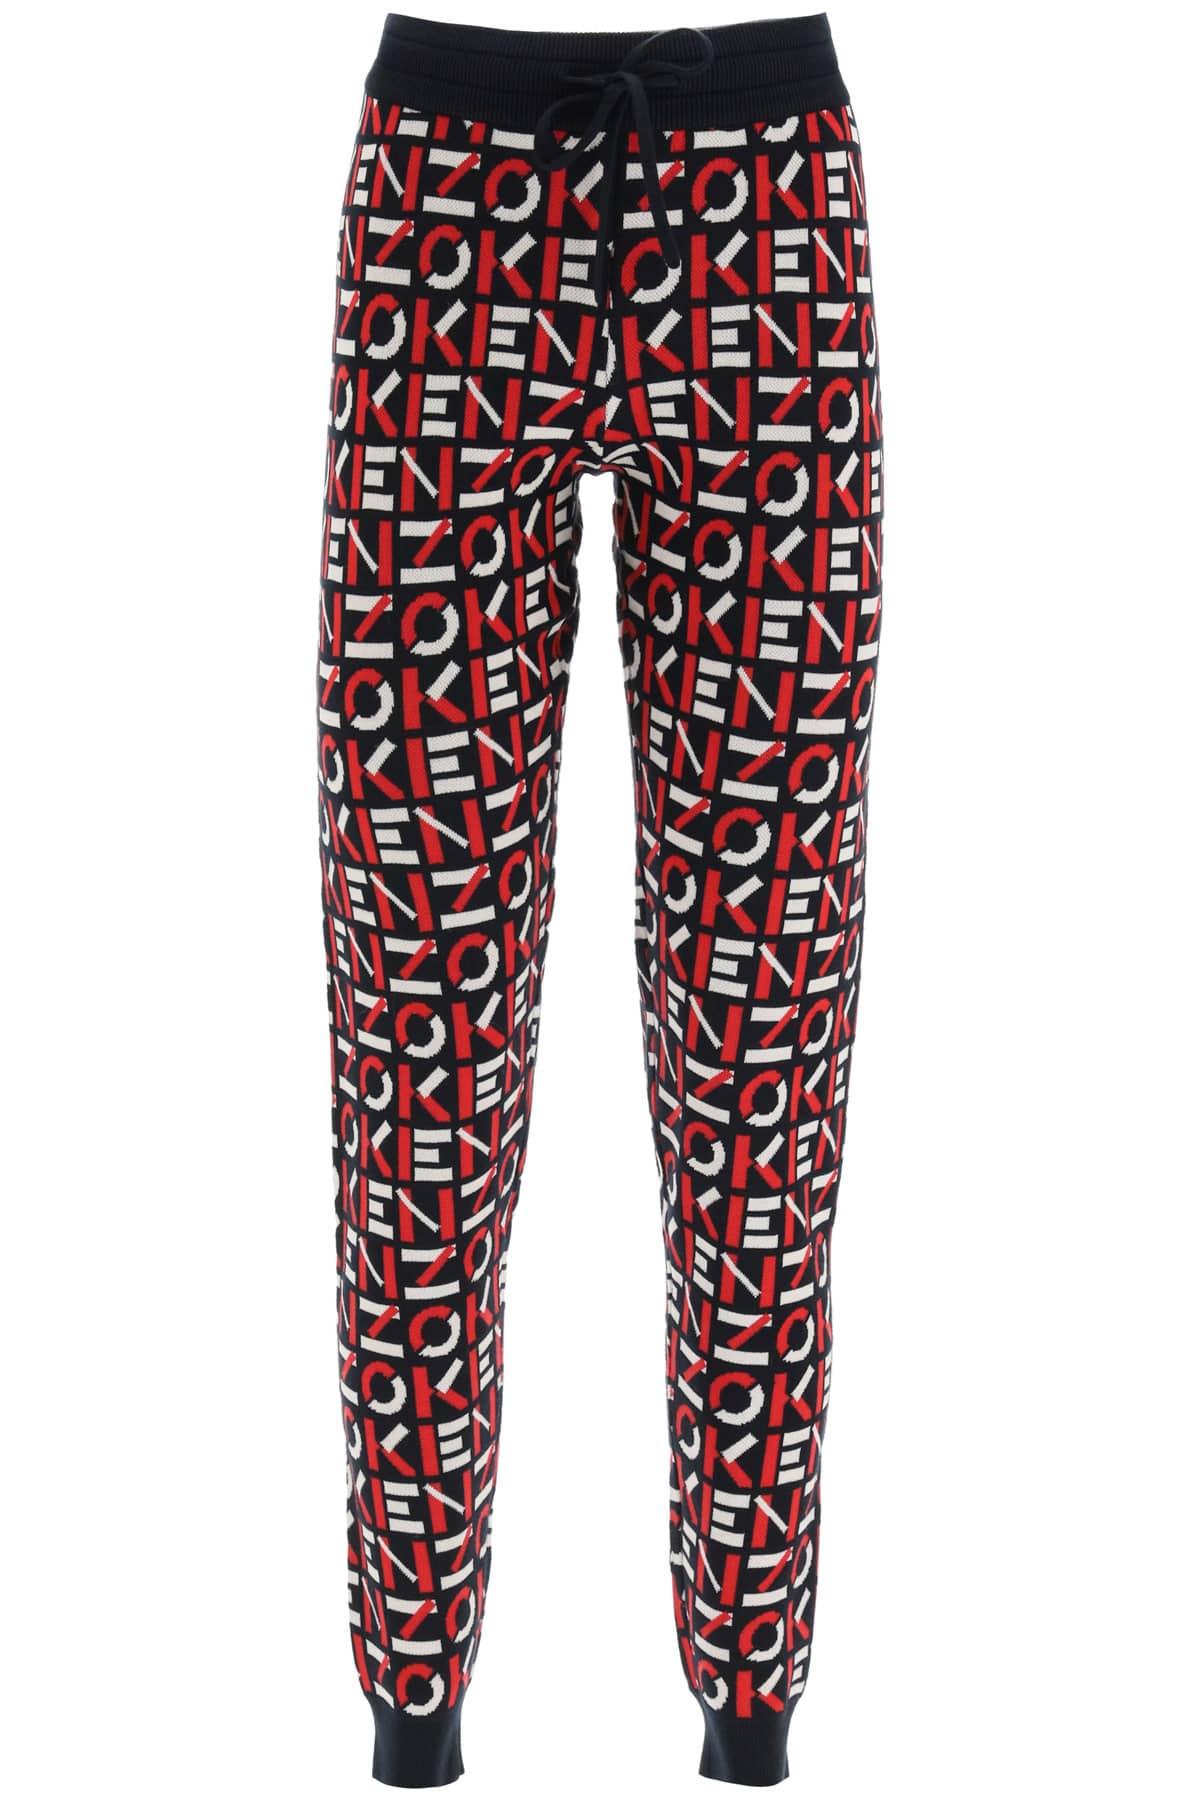 KENZO MONOGRAM JACQUARD JOGGER PANTS XS Black, Red, White Cotton